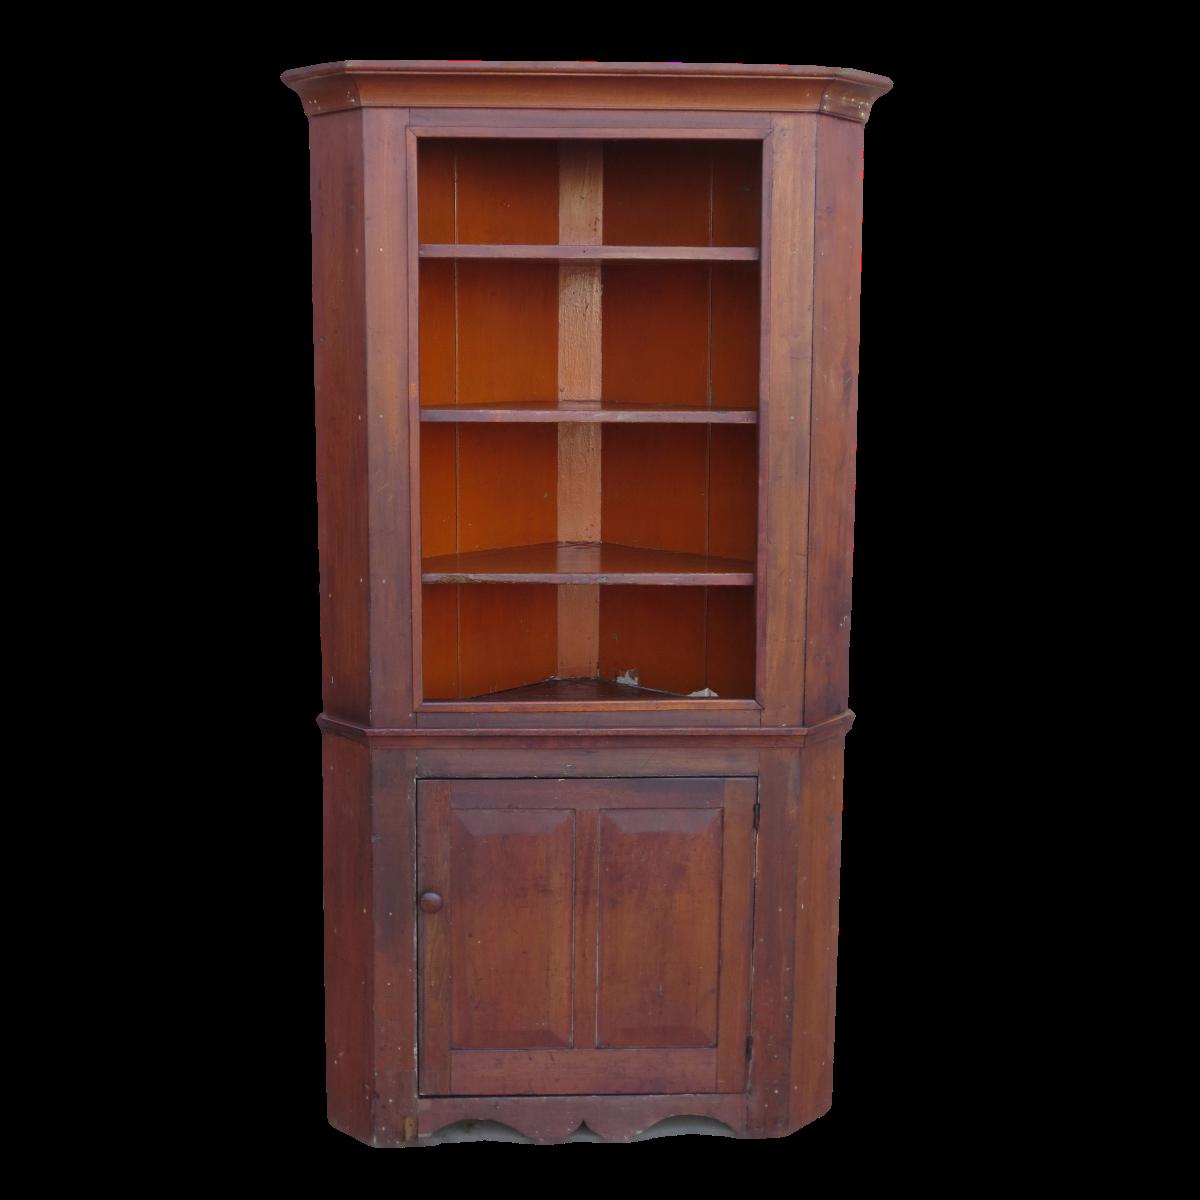 Cupboard closet png images. Dresser clipart cubboard